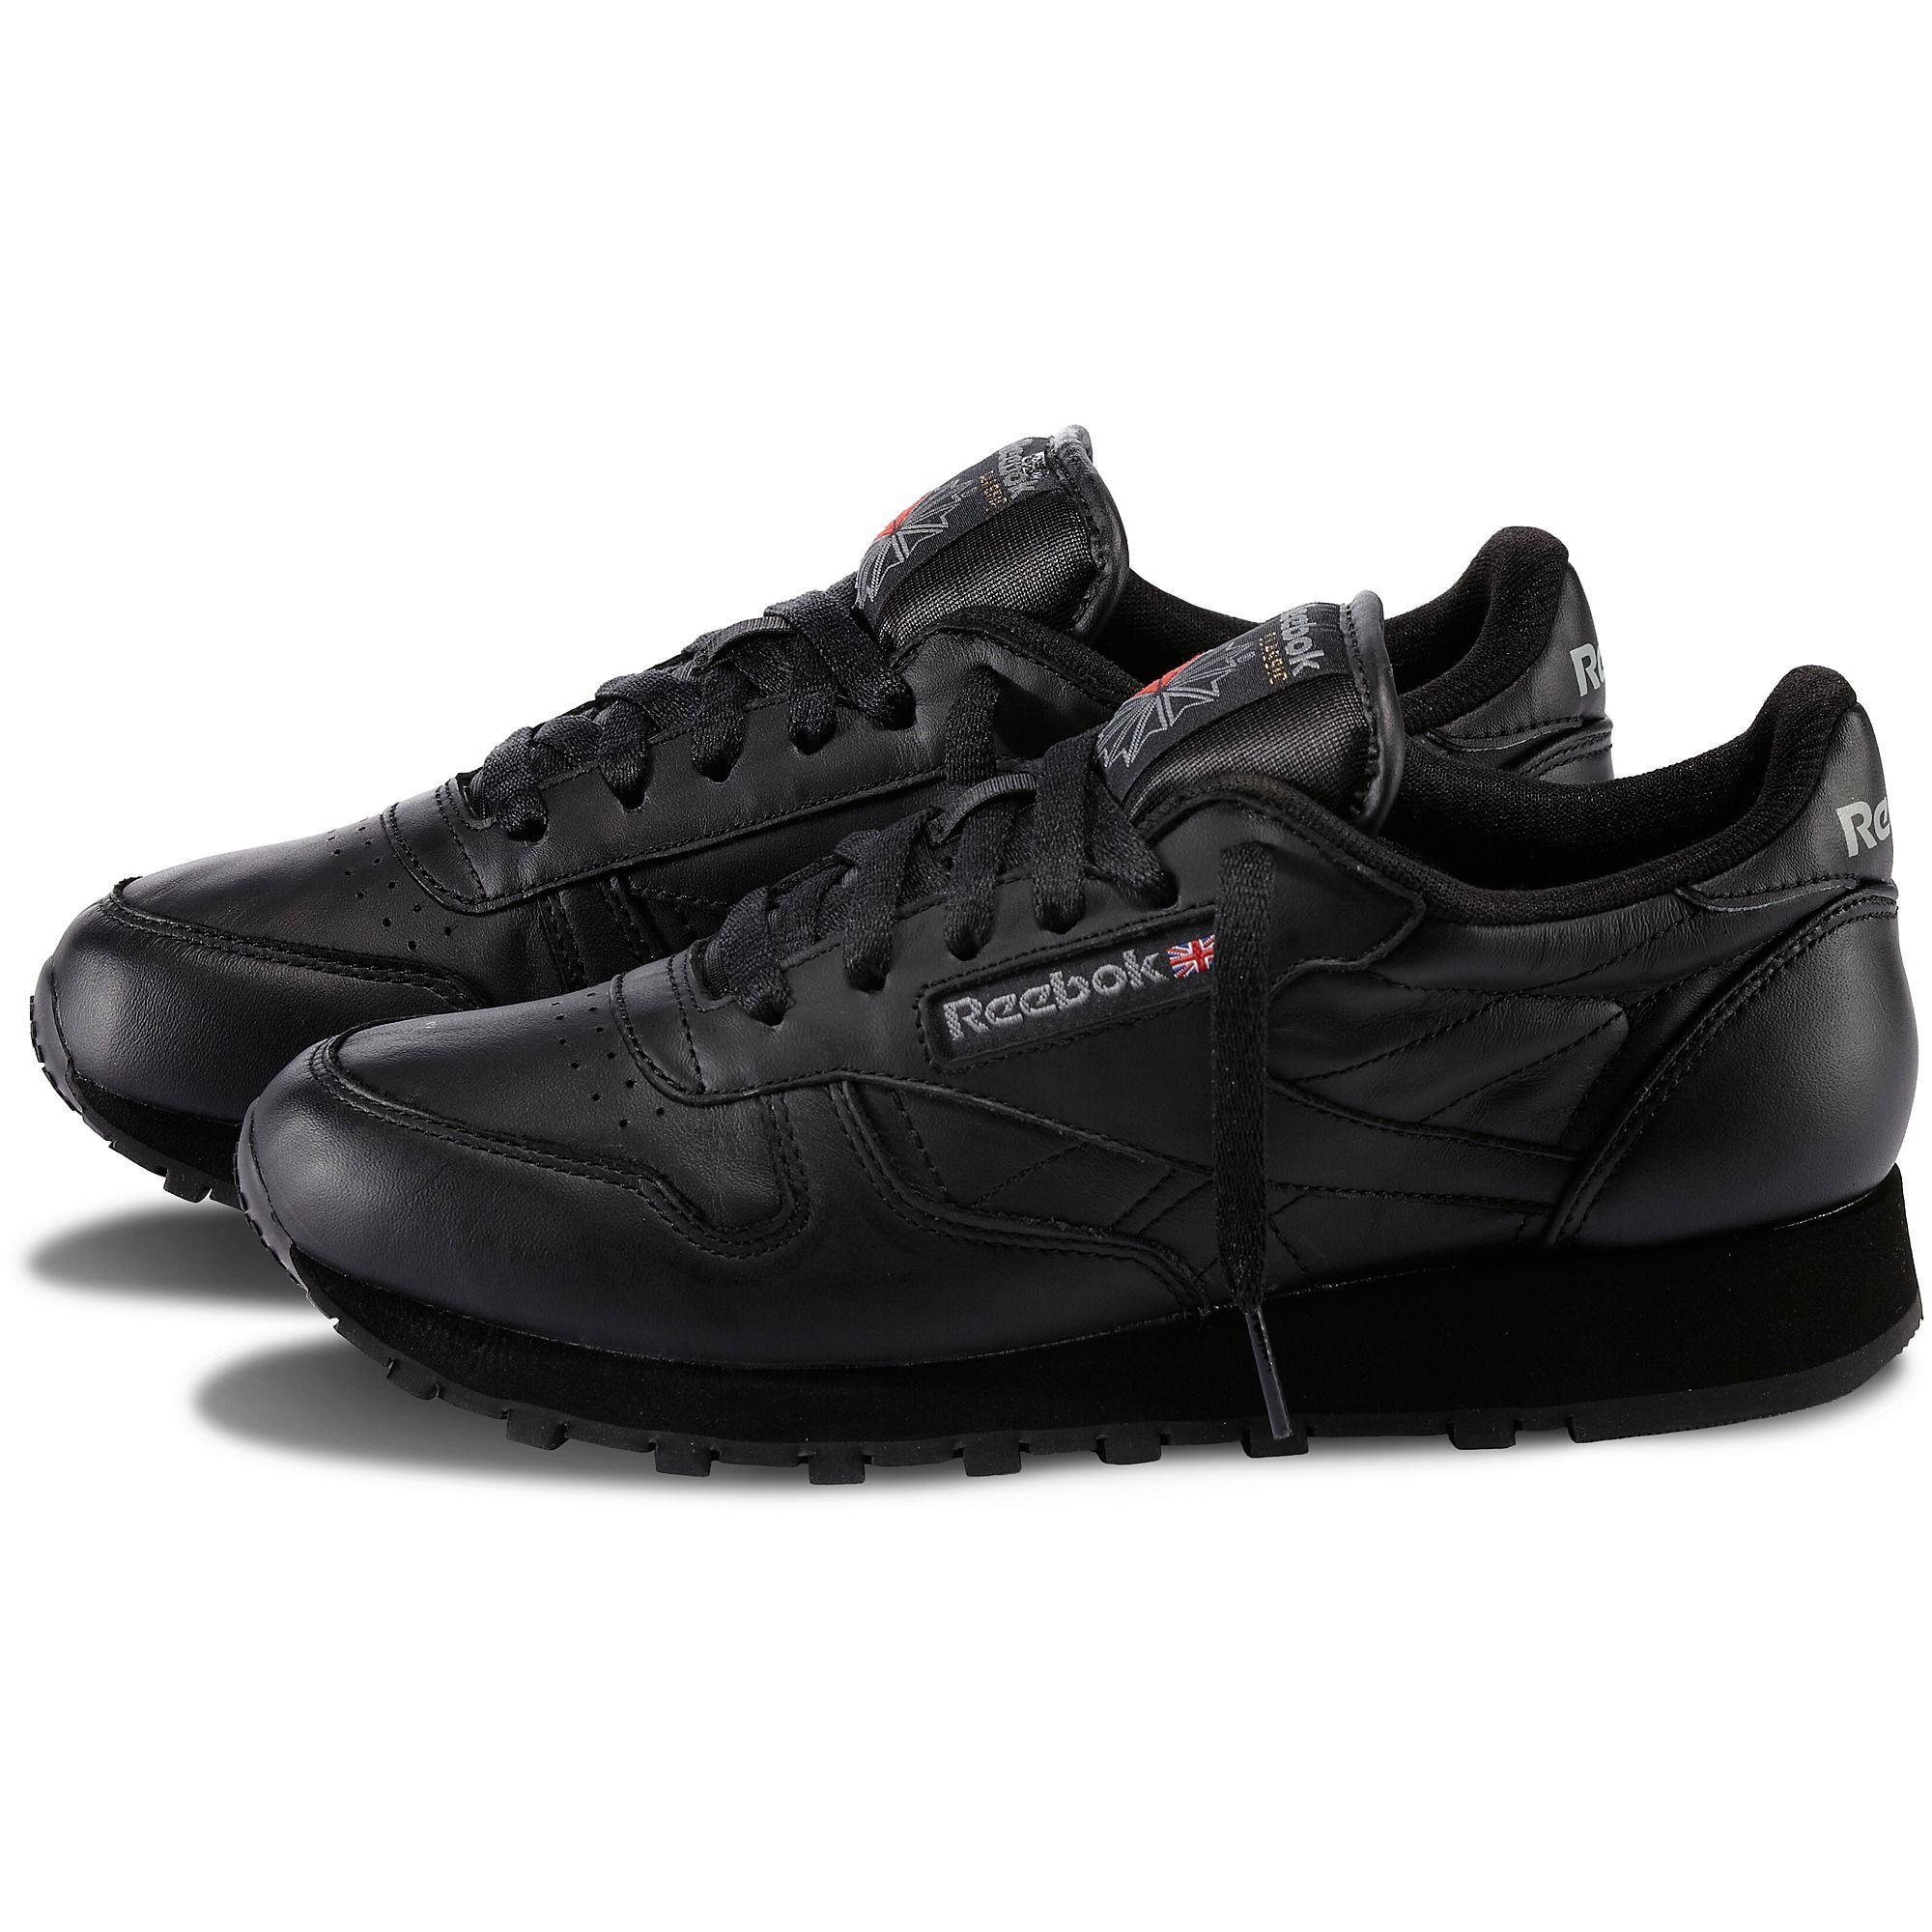 Reebok classic leather black, Reebok